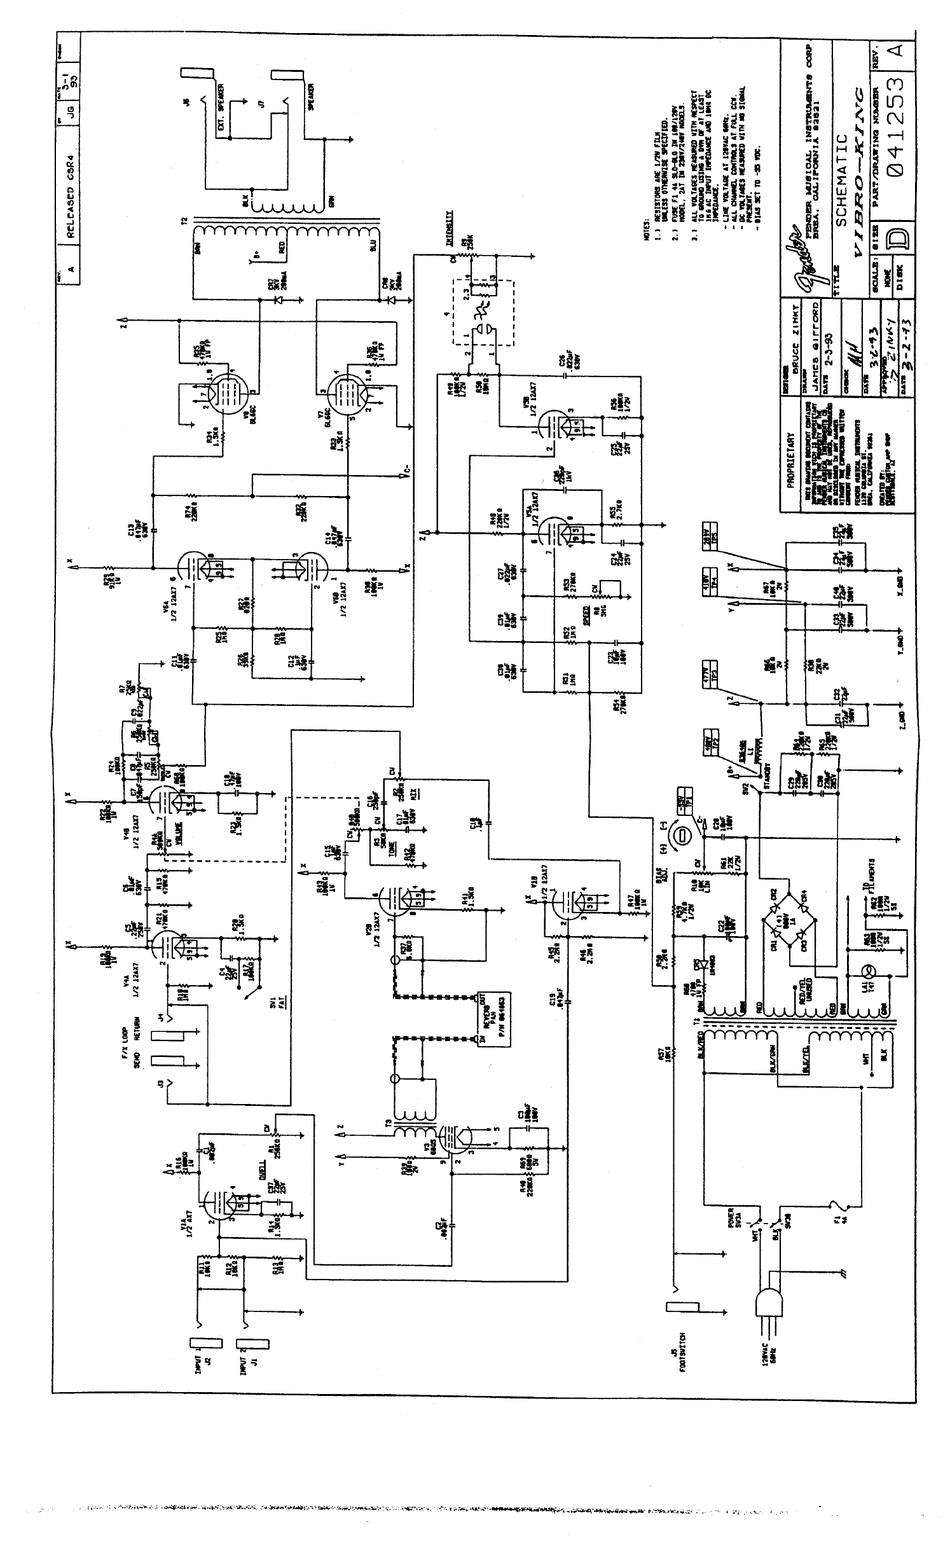 Fender Vibro King Wiring Diagram - Diagram Design Sources electrical-solid  - electrical-solid.nius-icbosa.itnius-icbosa.it